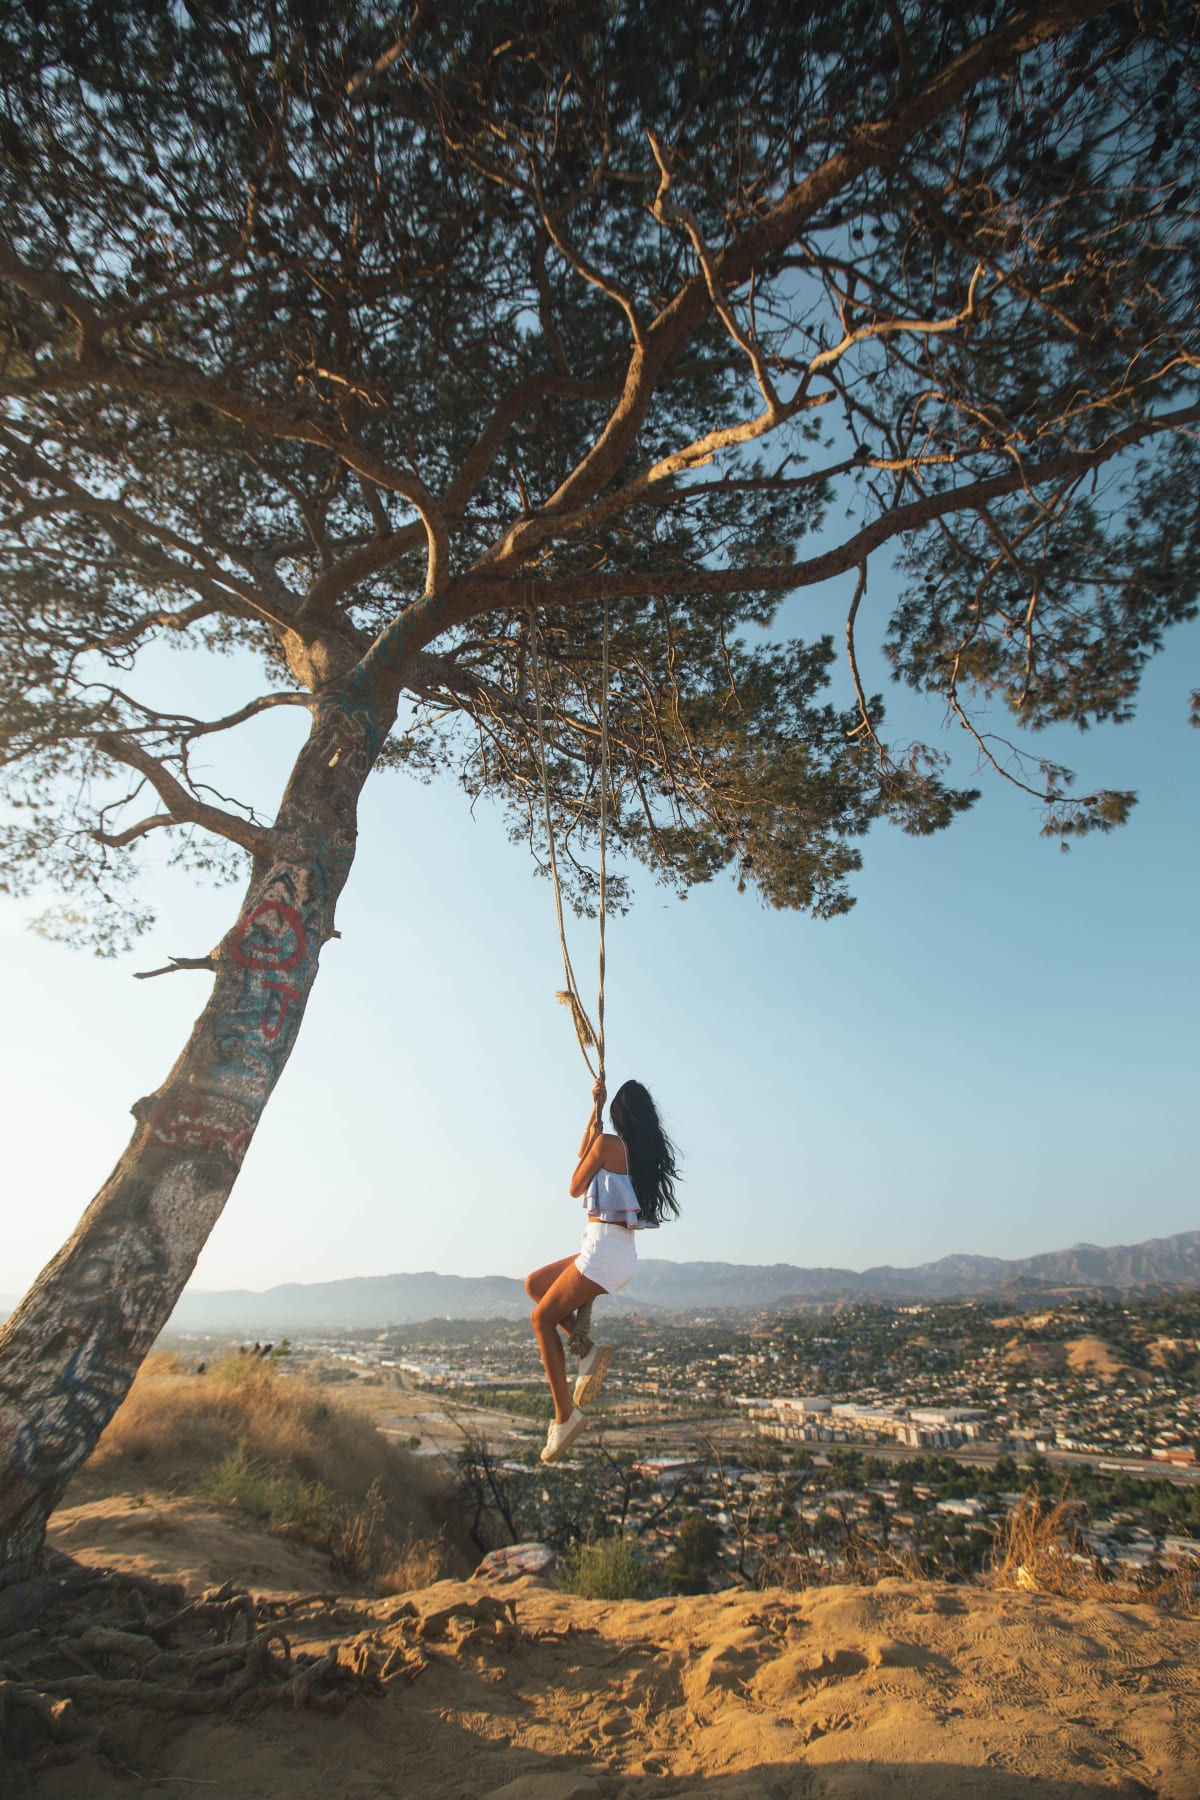 Secret Swing, Elysian Park. Photo by Roberto Nickson on Unsplash